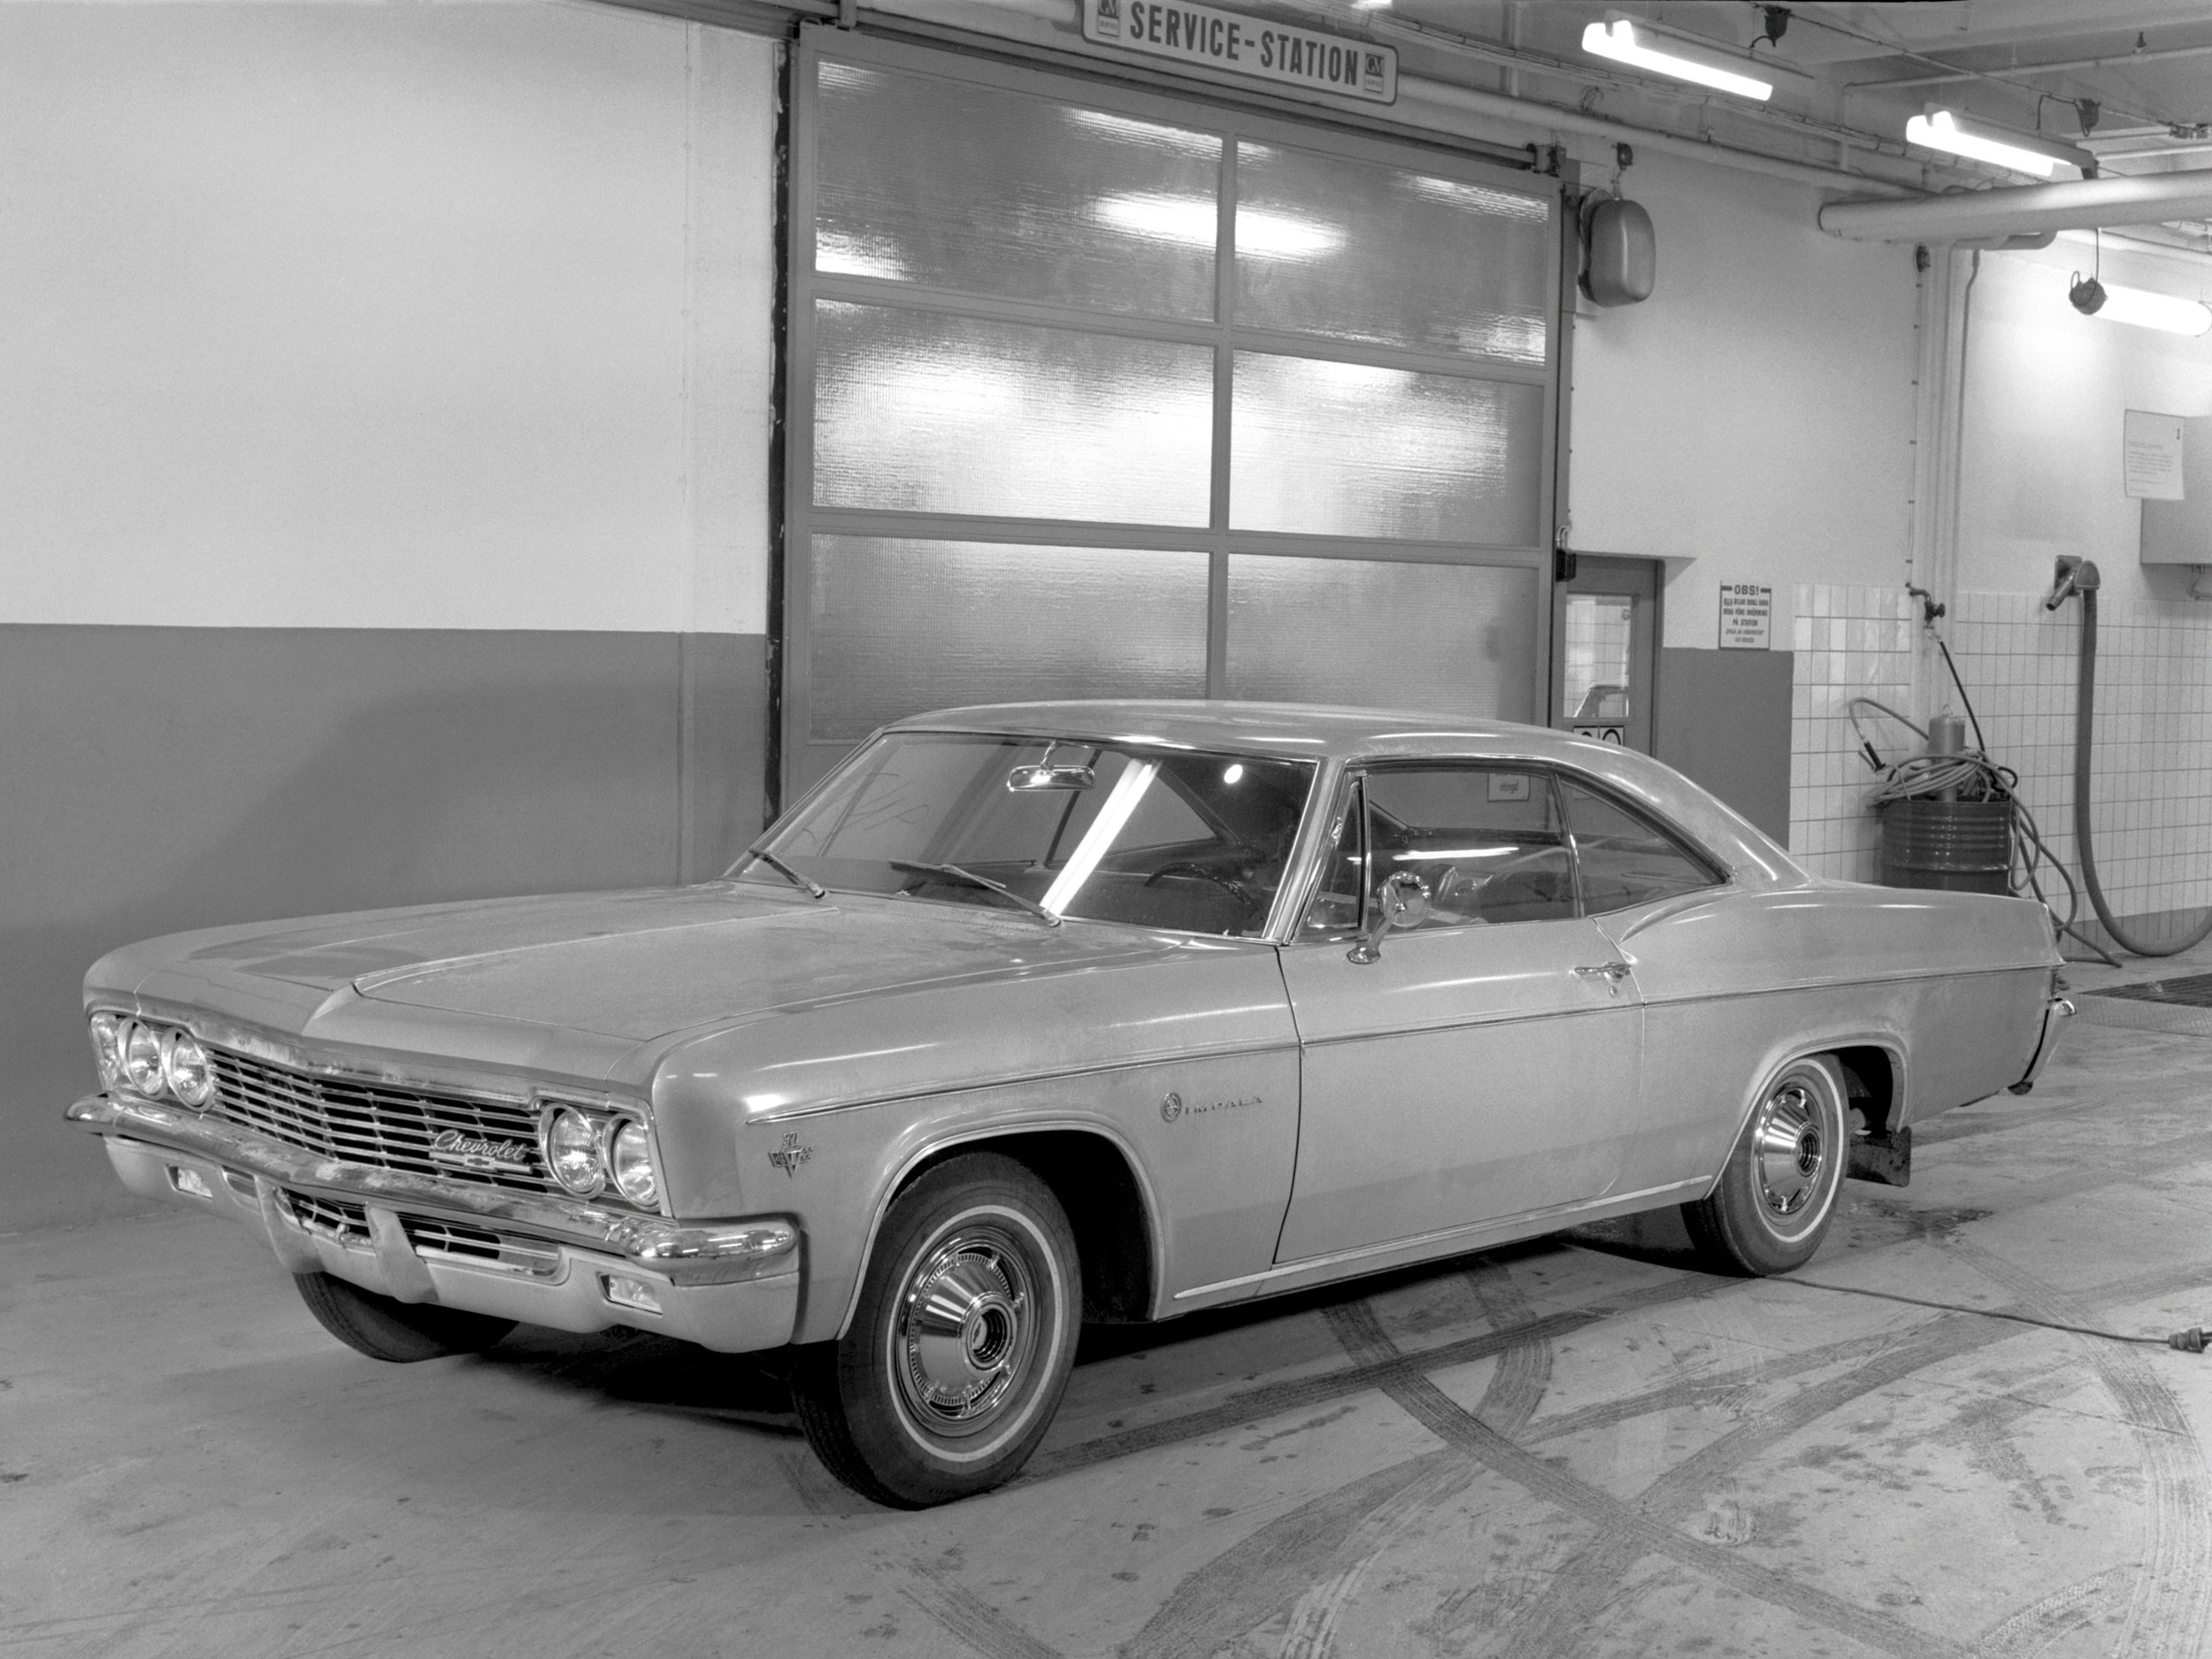 1966-chevrolet_impala-01.jpeg